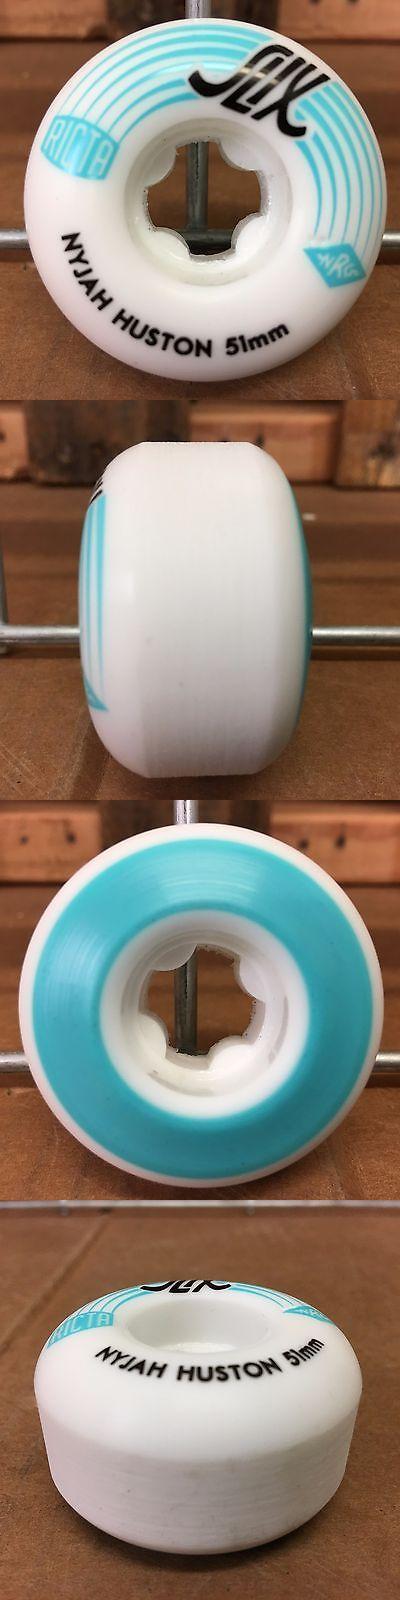 Wheels 23830: New Ricta Nyjah Huston Slix White Skateboard Wheels - 51Mm 81B - (Set Of 4) -> BUY IT NOW ONLY: $34.95 on eBay!